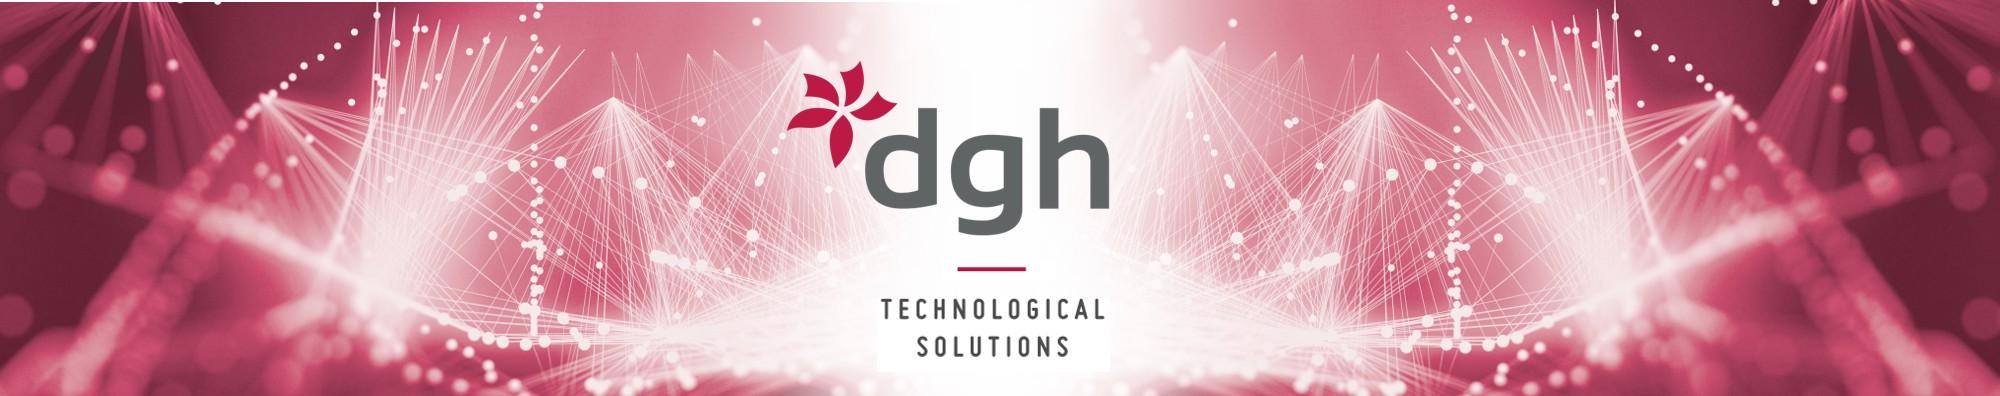 DGH Technological Solutions | LinkedIn